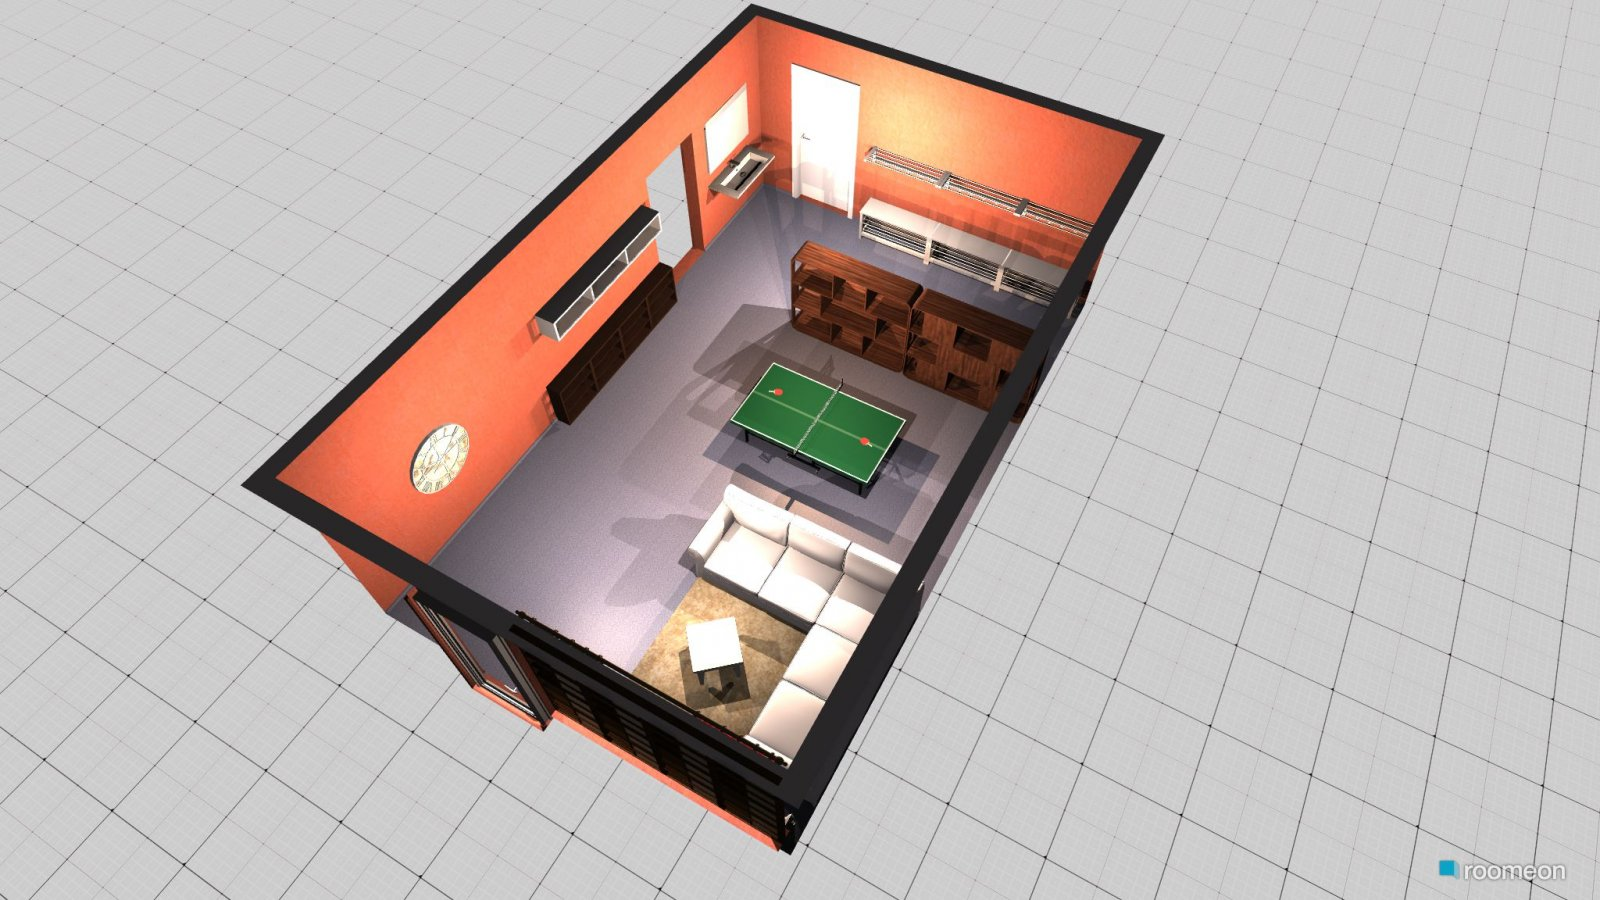 Raumplanung hort roomeon community for Raumgestaltung hort